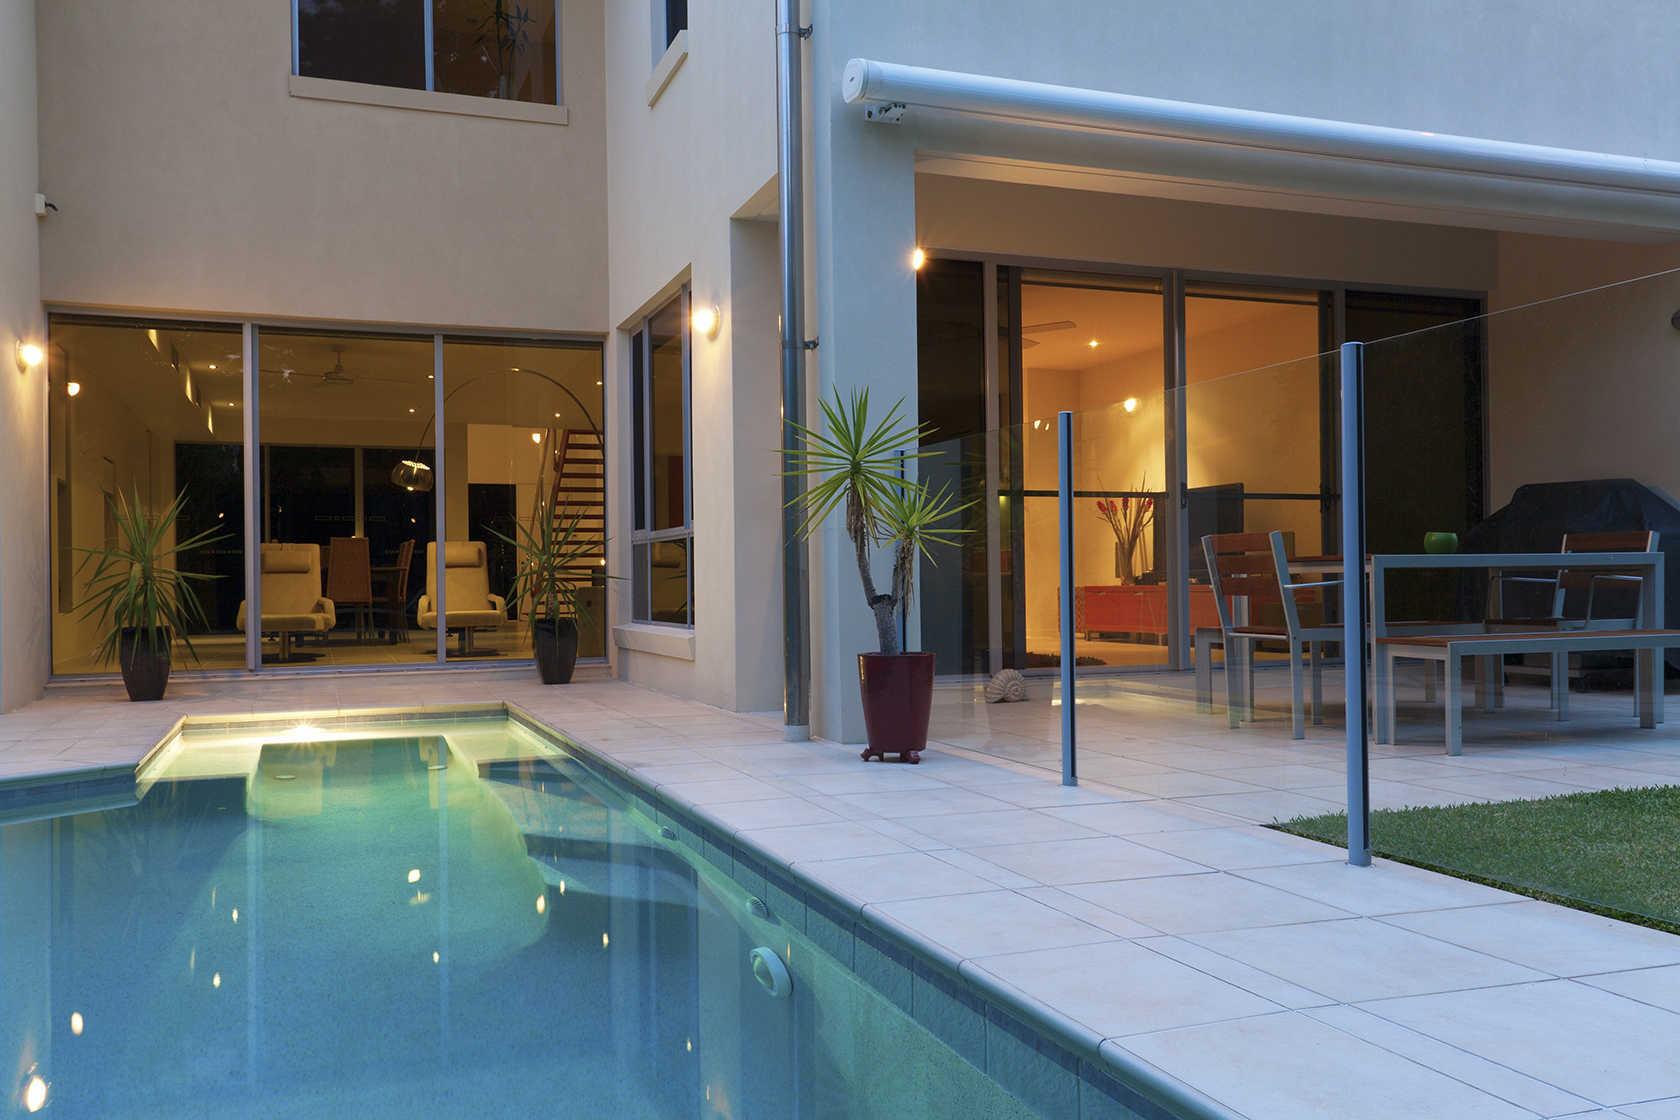 Entrada de Casa moderna de grandes ventanas piscina iluminada